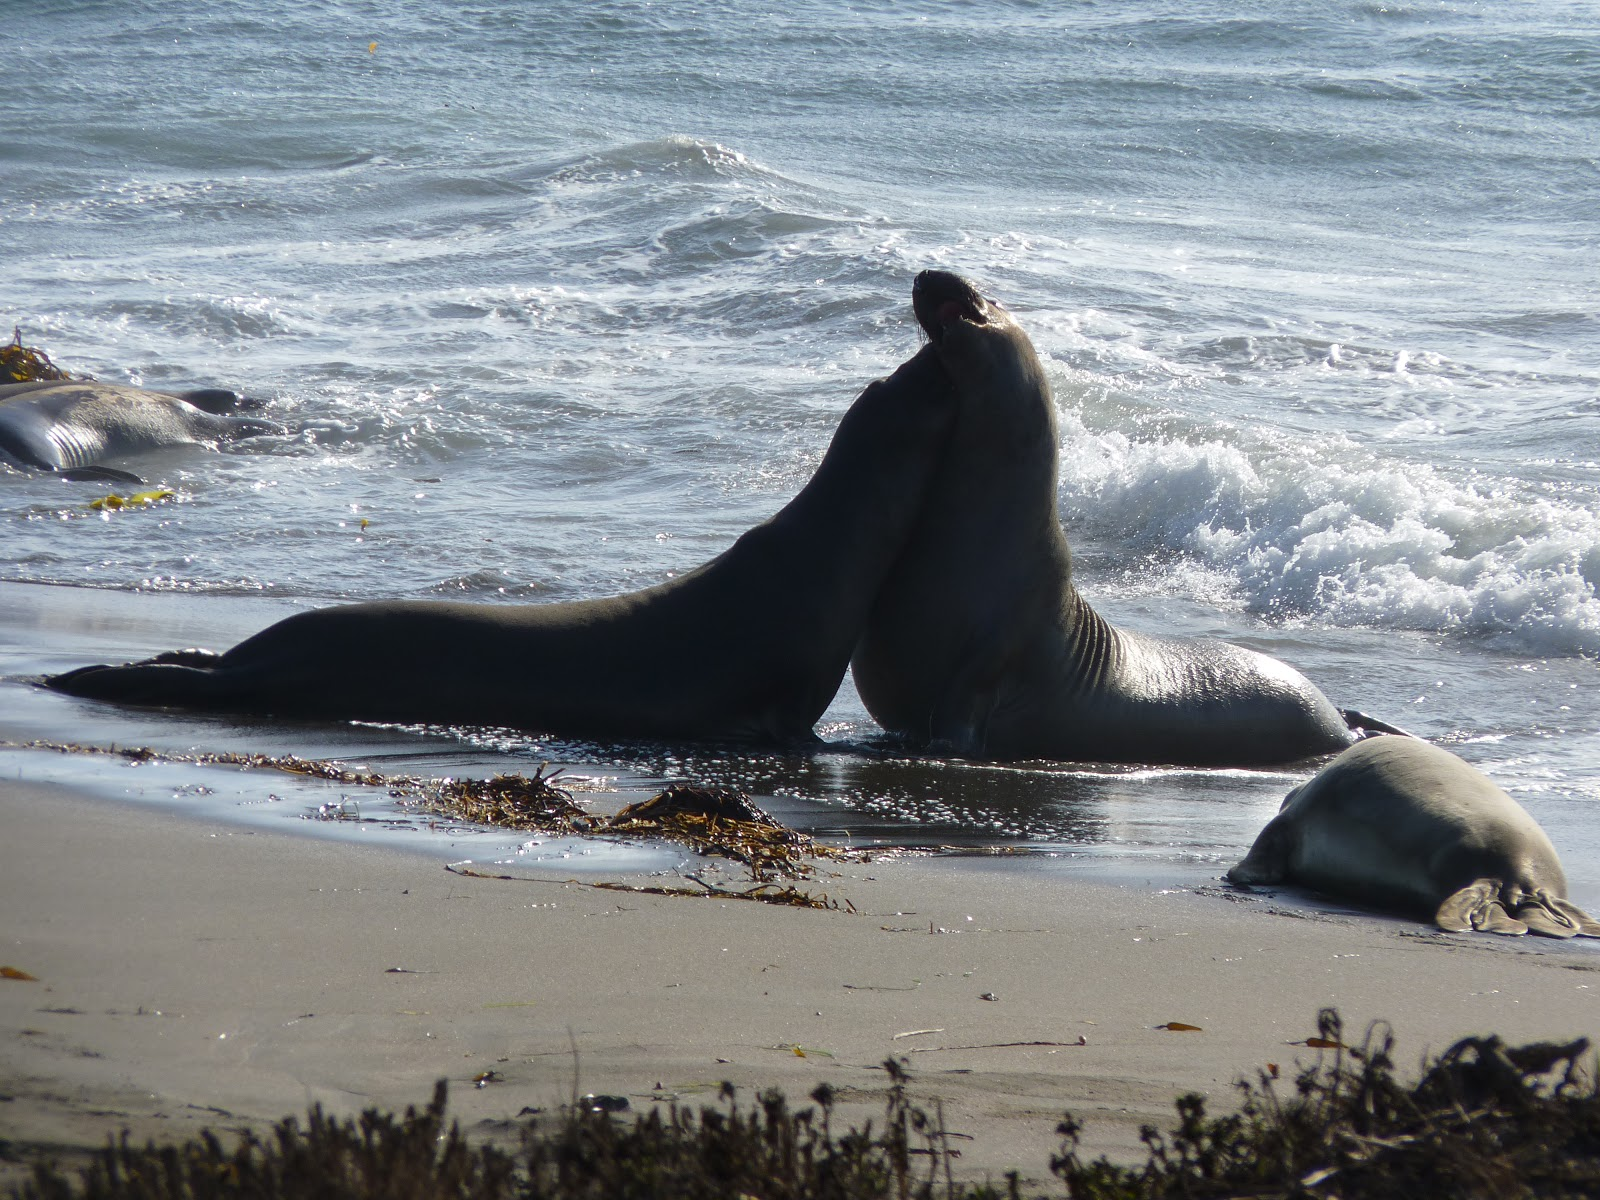 Les éléphants de mer de Piedras Blancas